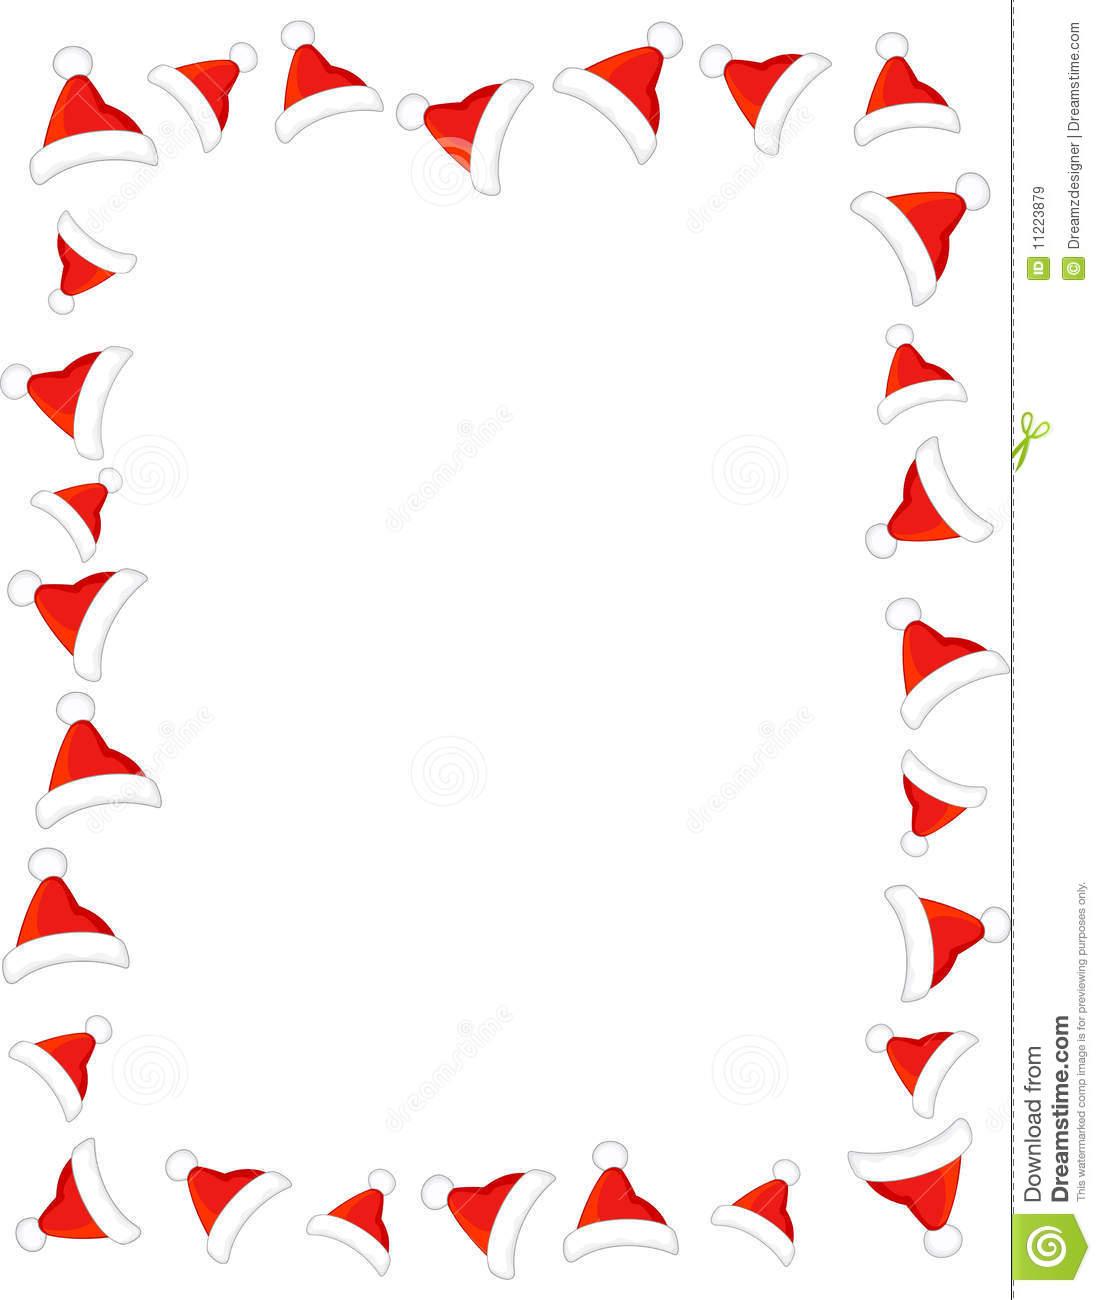 Christmas Page Border.Christmas Page Borders For Microsoft Word Free Download